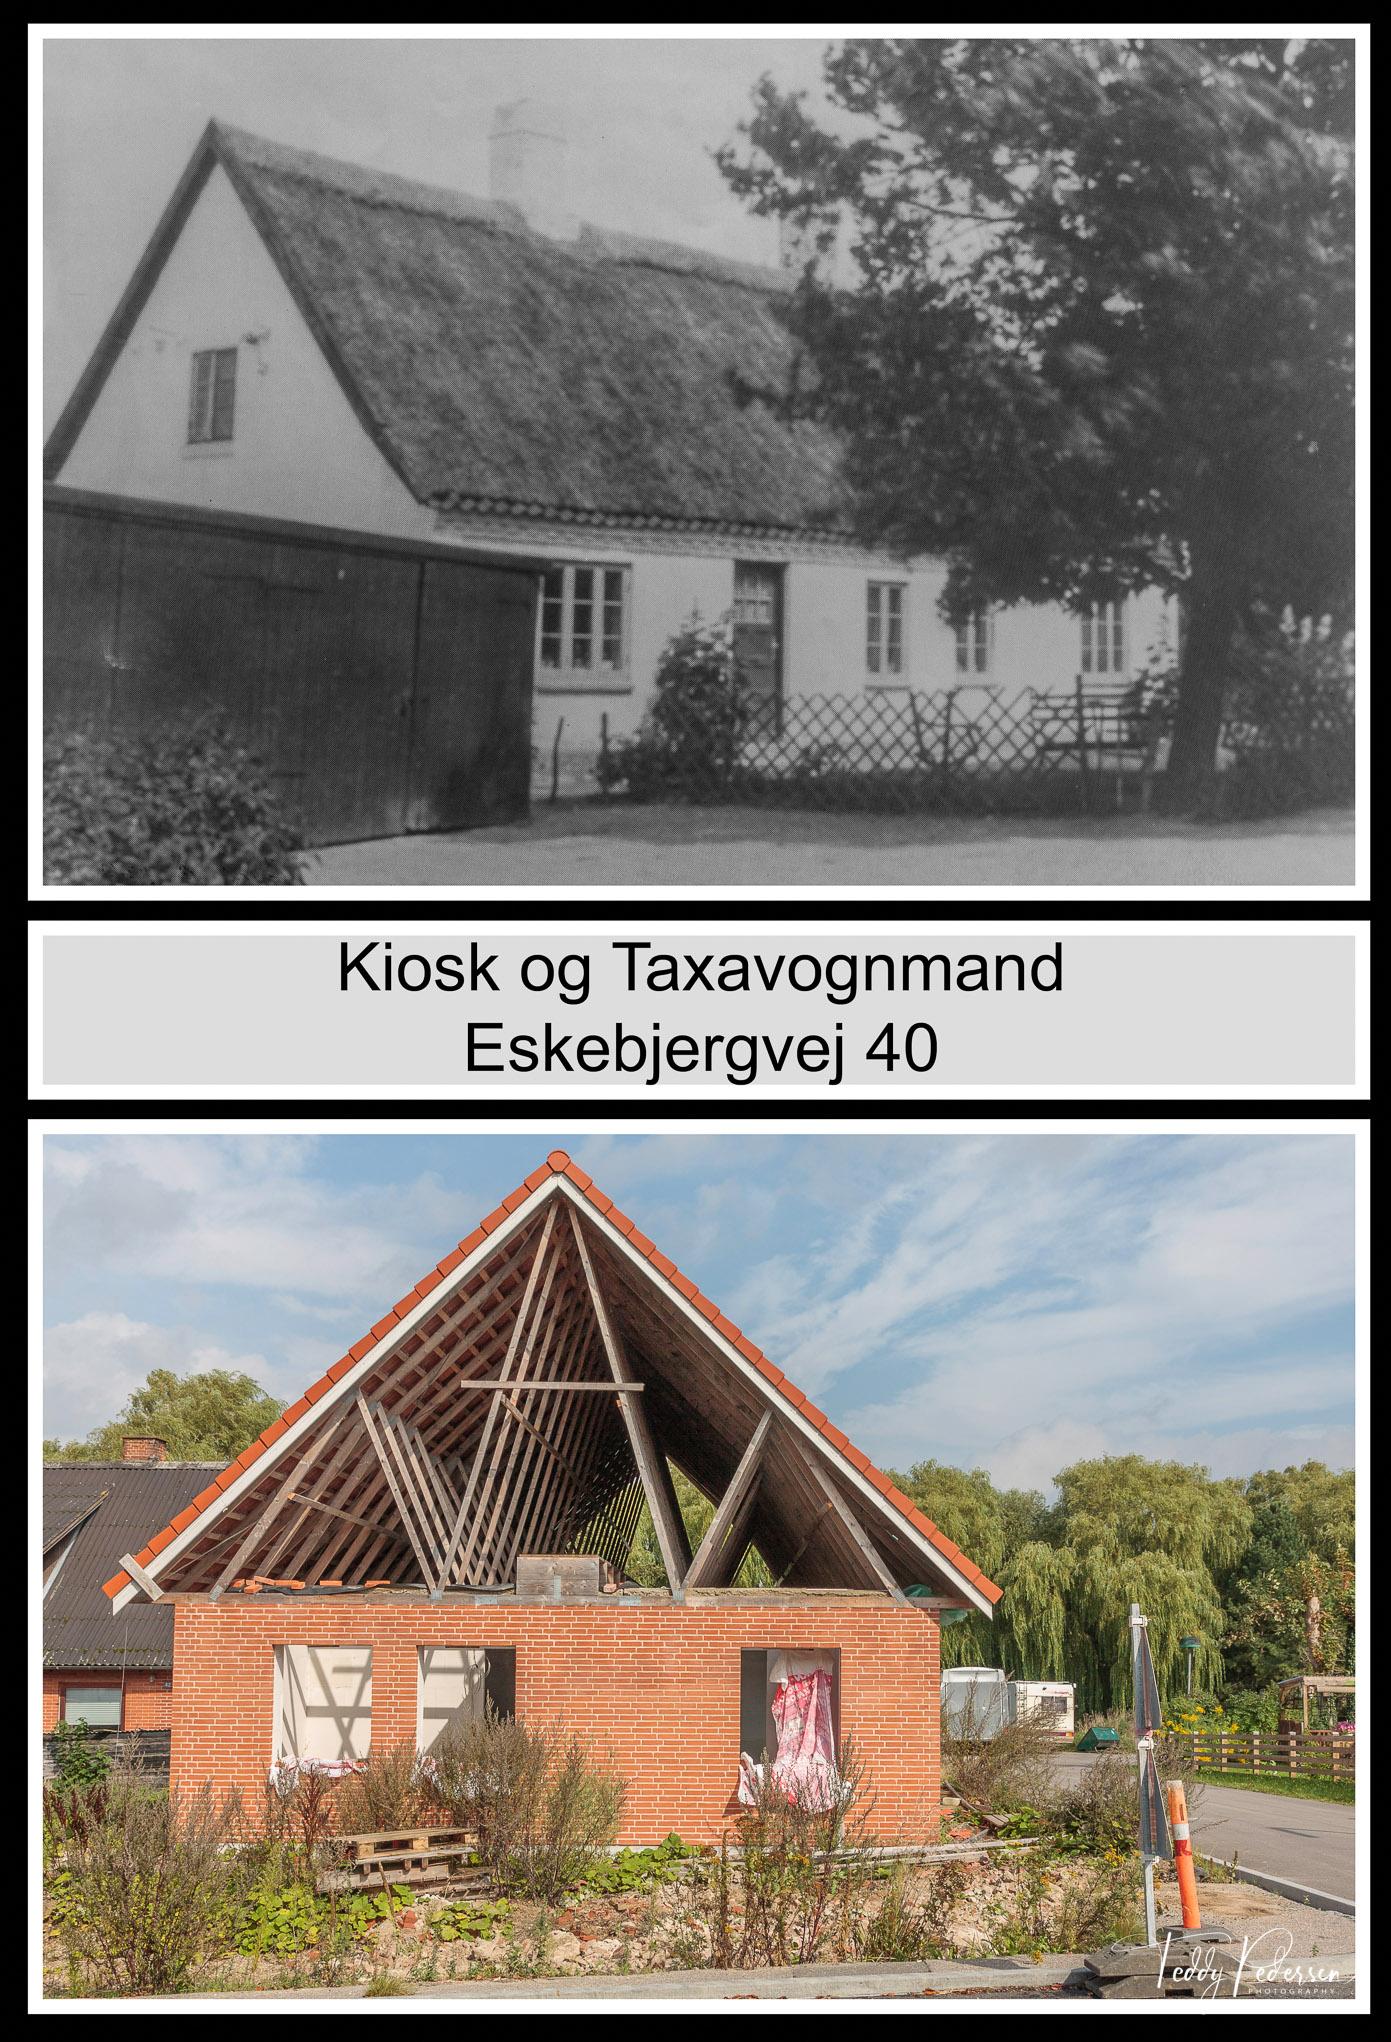 014-013-Kiosk-og-Taxavognmand_HighRes_LowRes